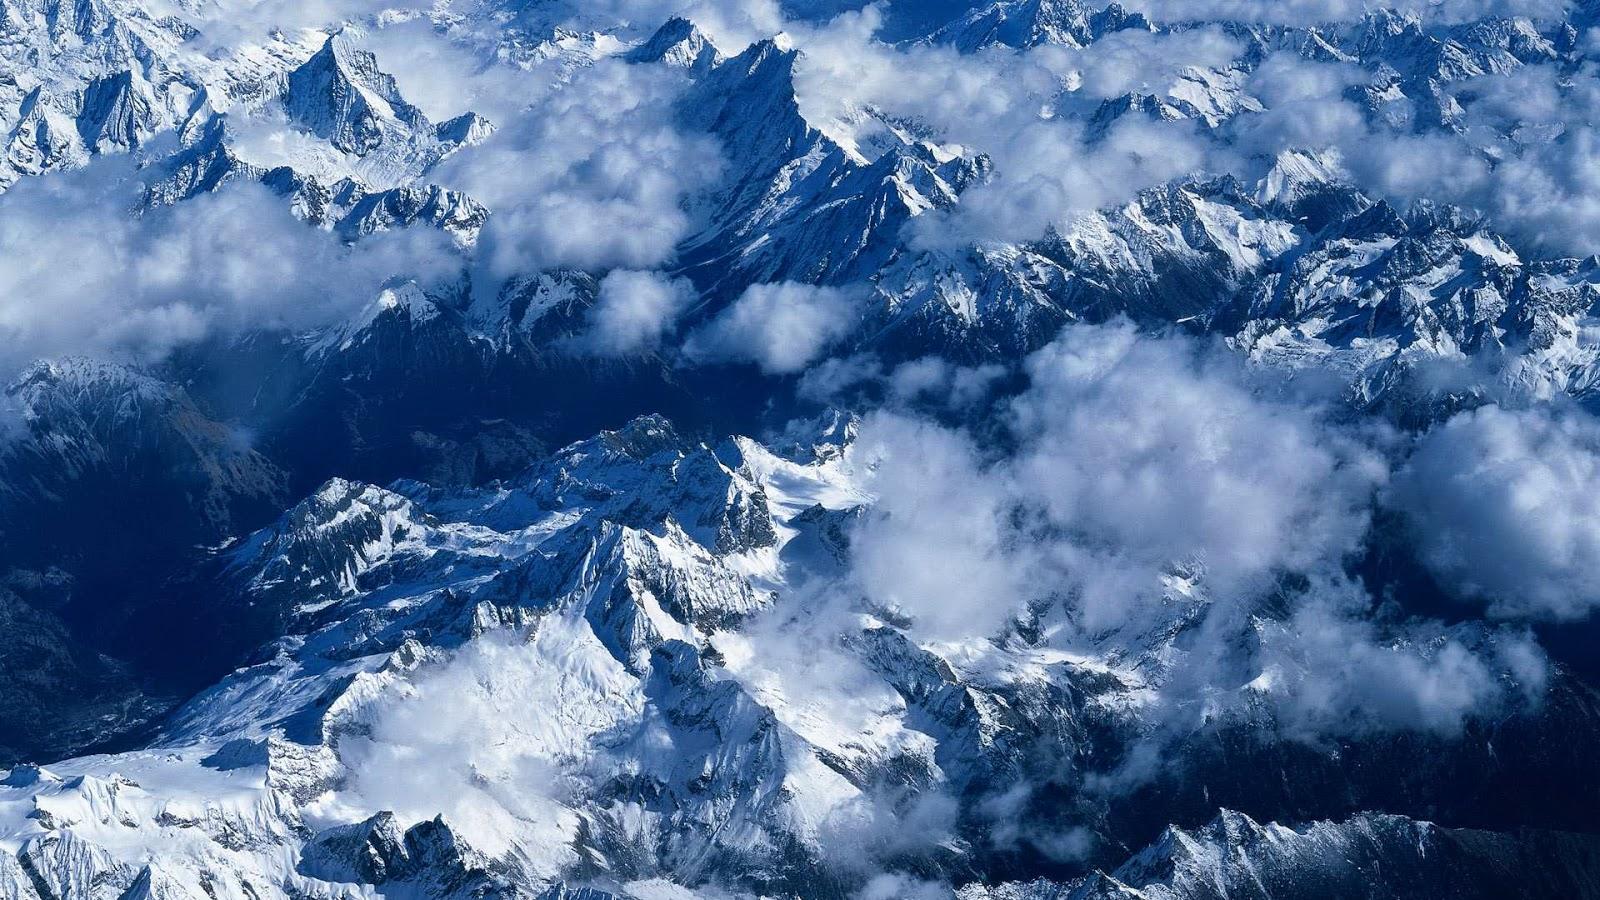 Bergtoppen vanuit de lucht